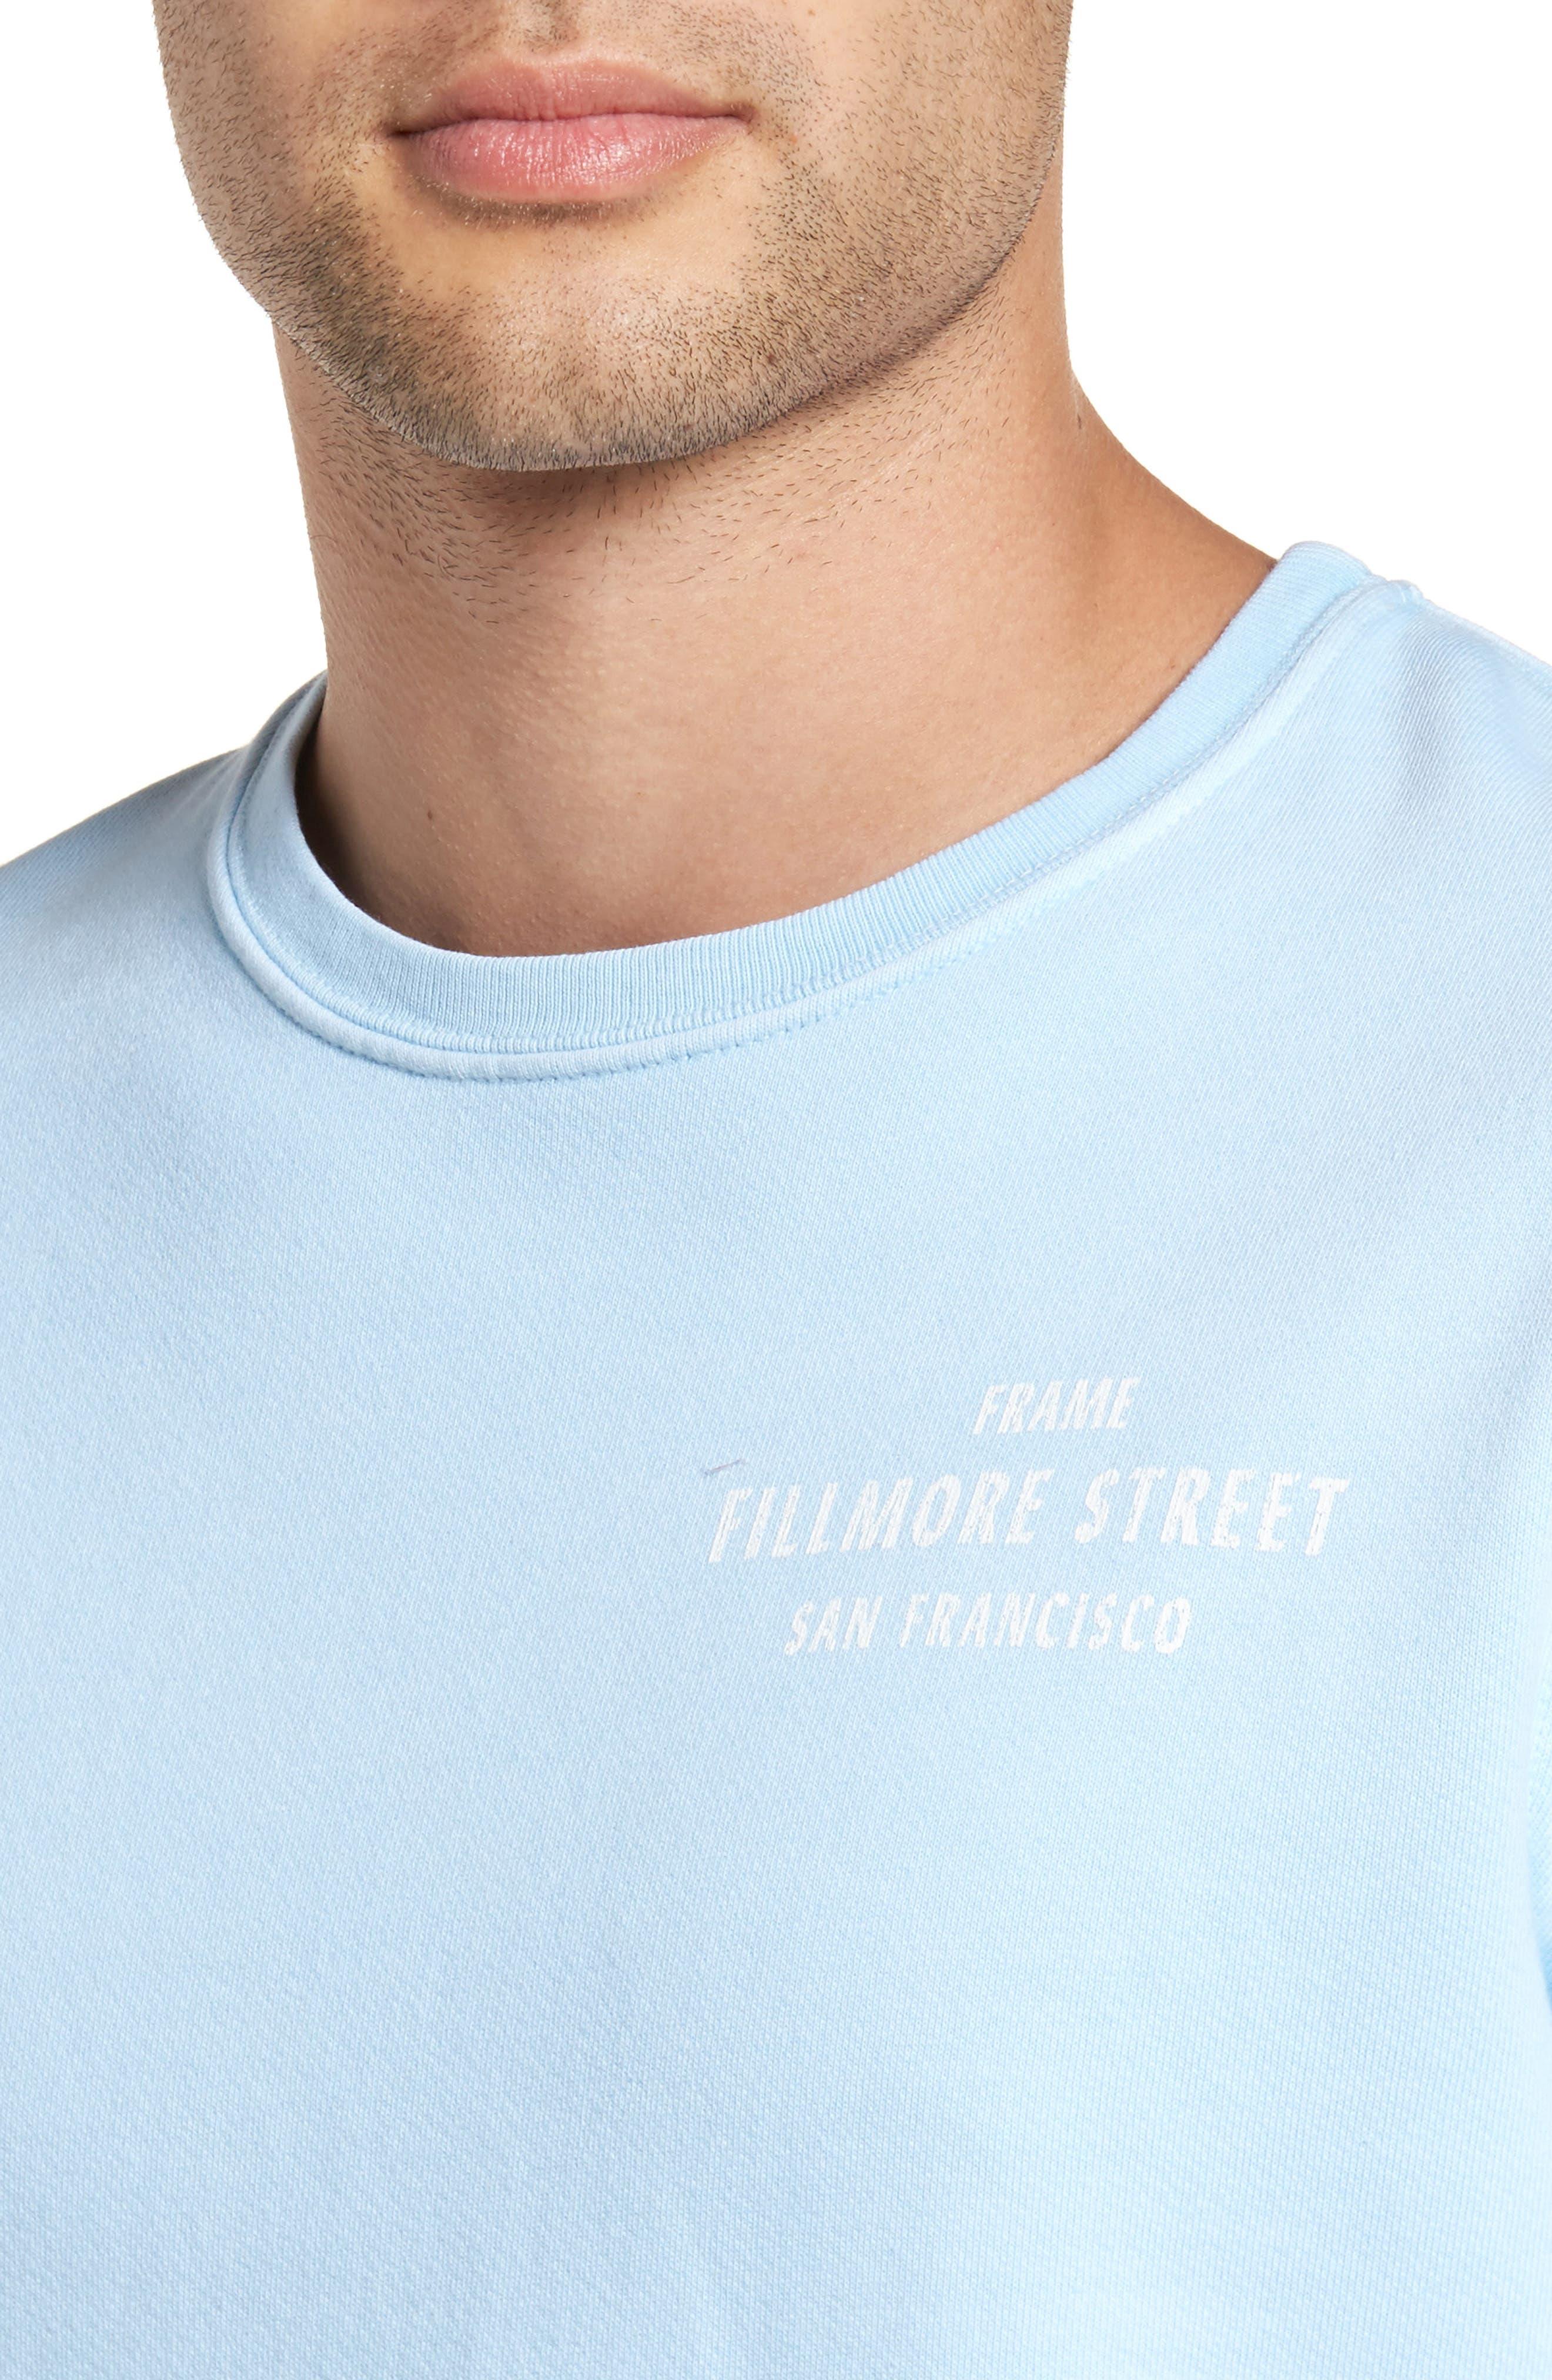 Vintage Crewneck Sweatshirt,                             Alternate thumbnail 4, color,                             400